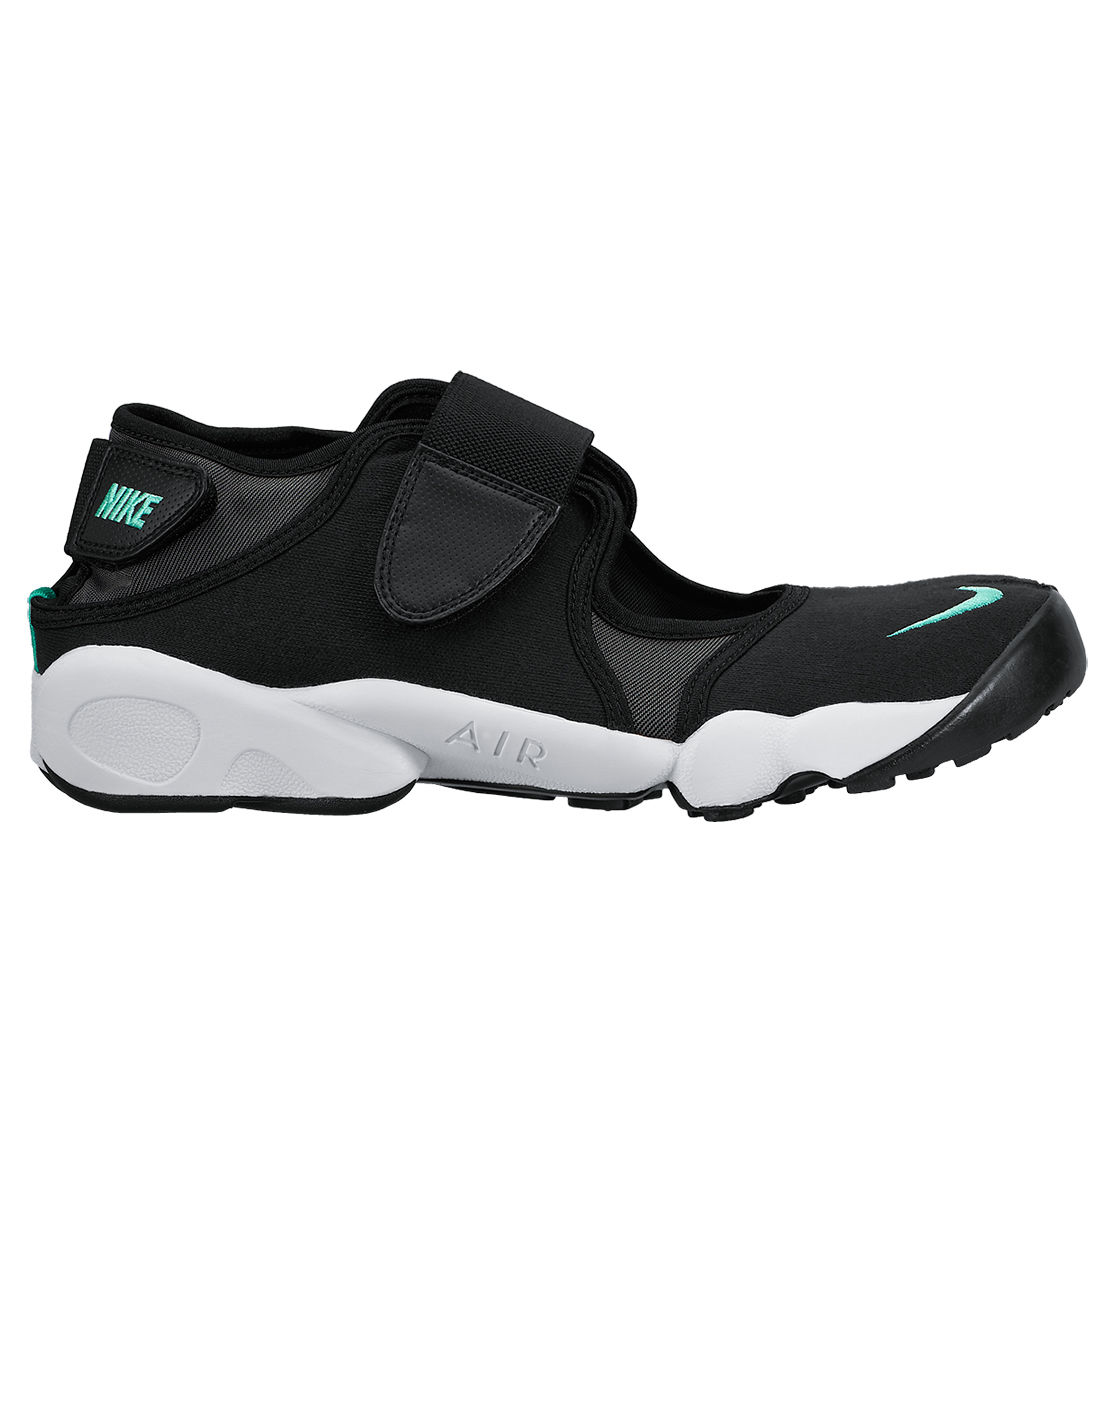 nike air rift black sneakers in black for men lyst. Black Bedroom Furniture Sets. Home Design Ideas